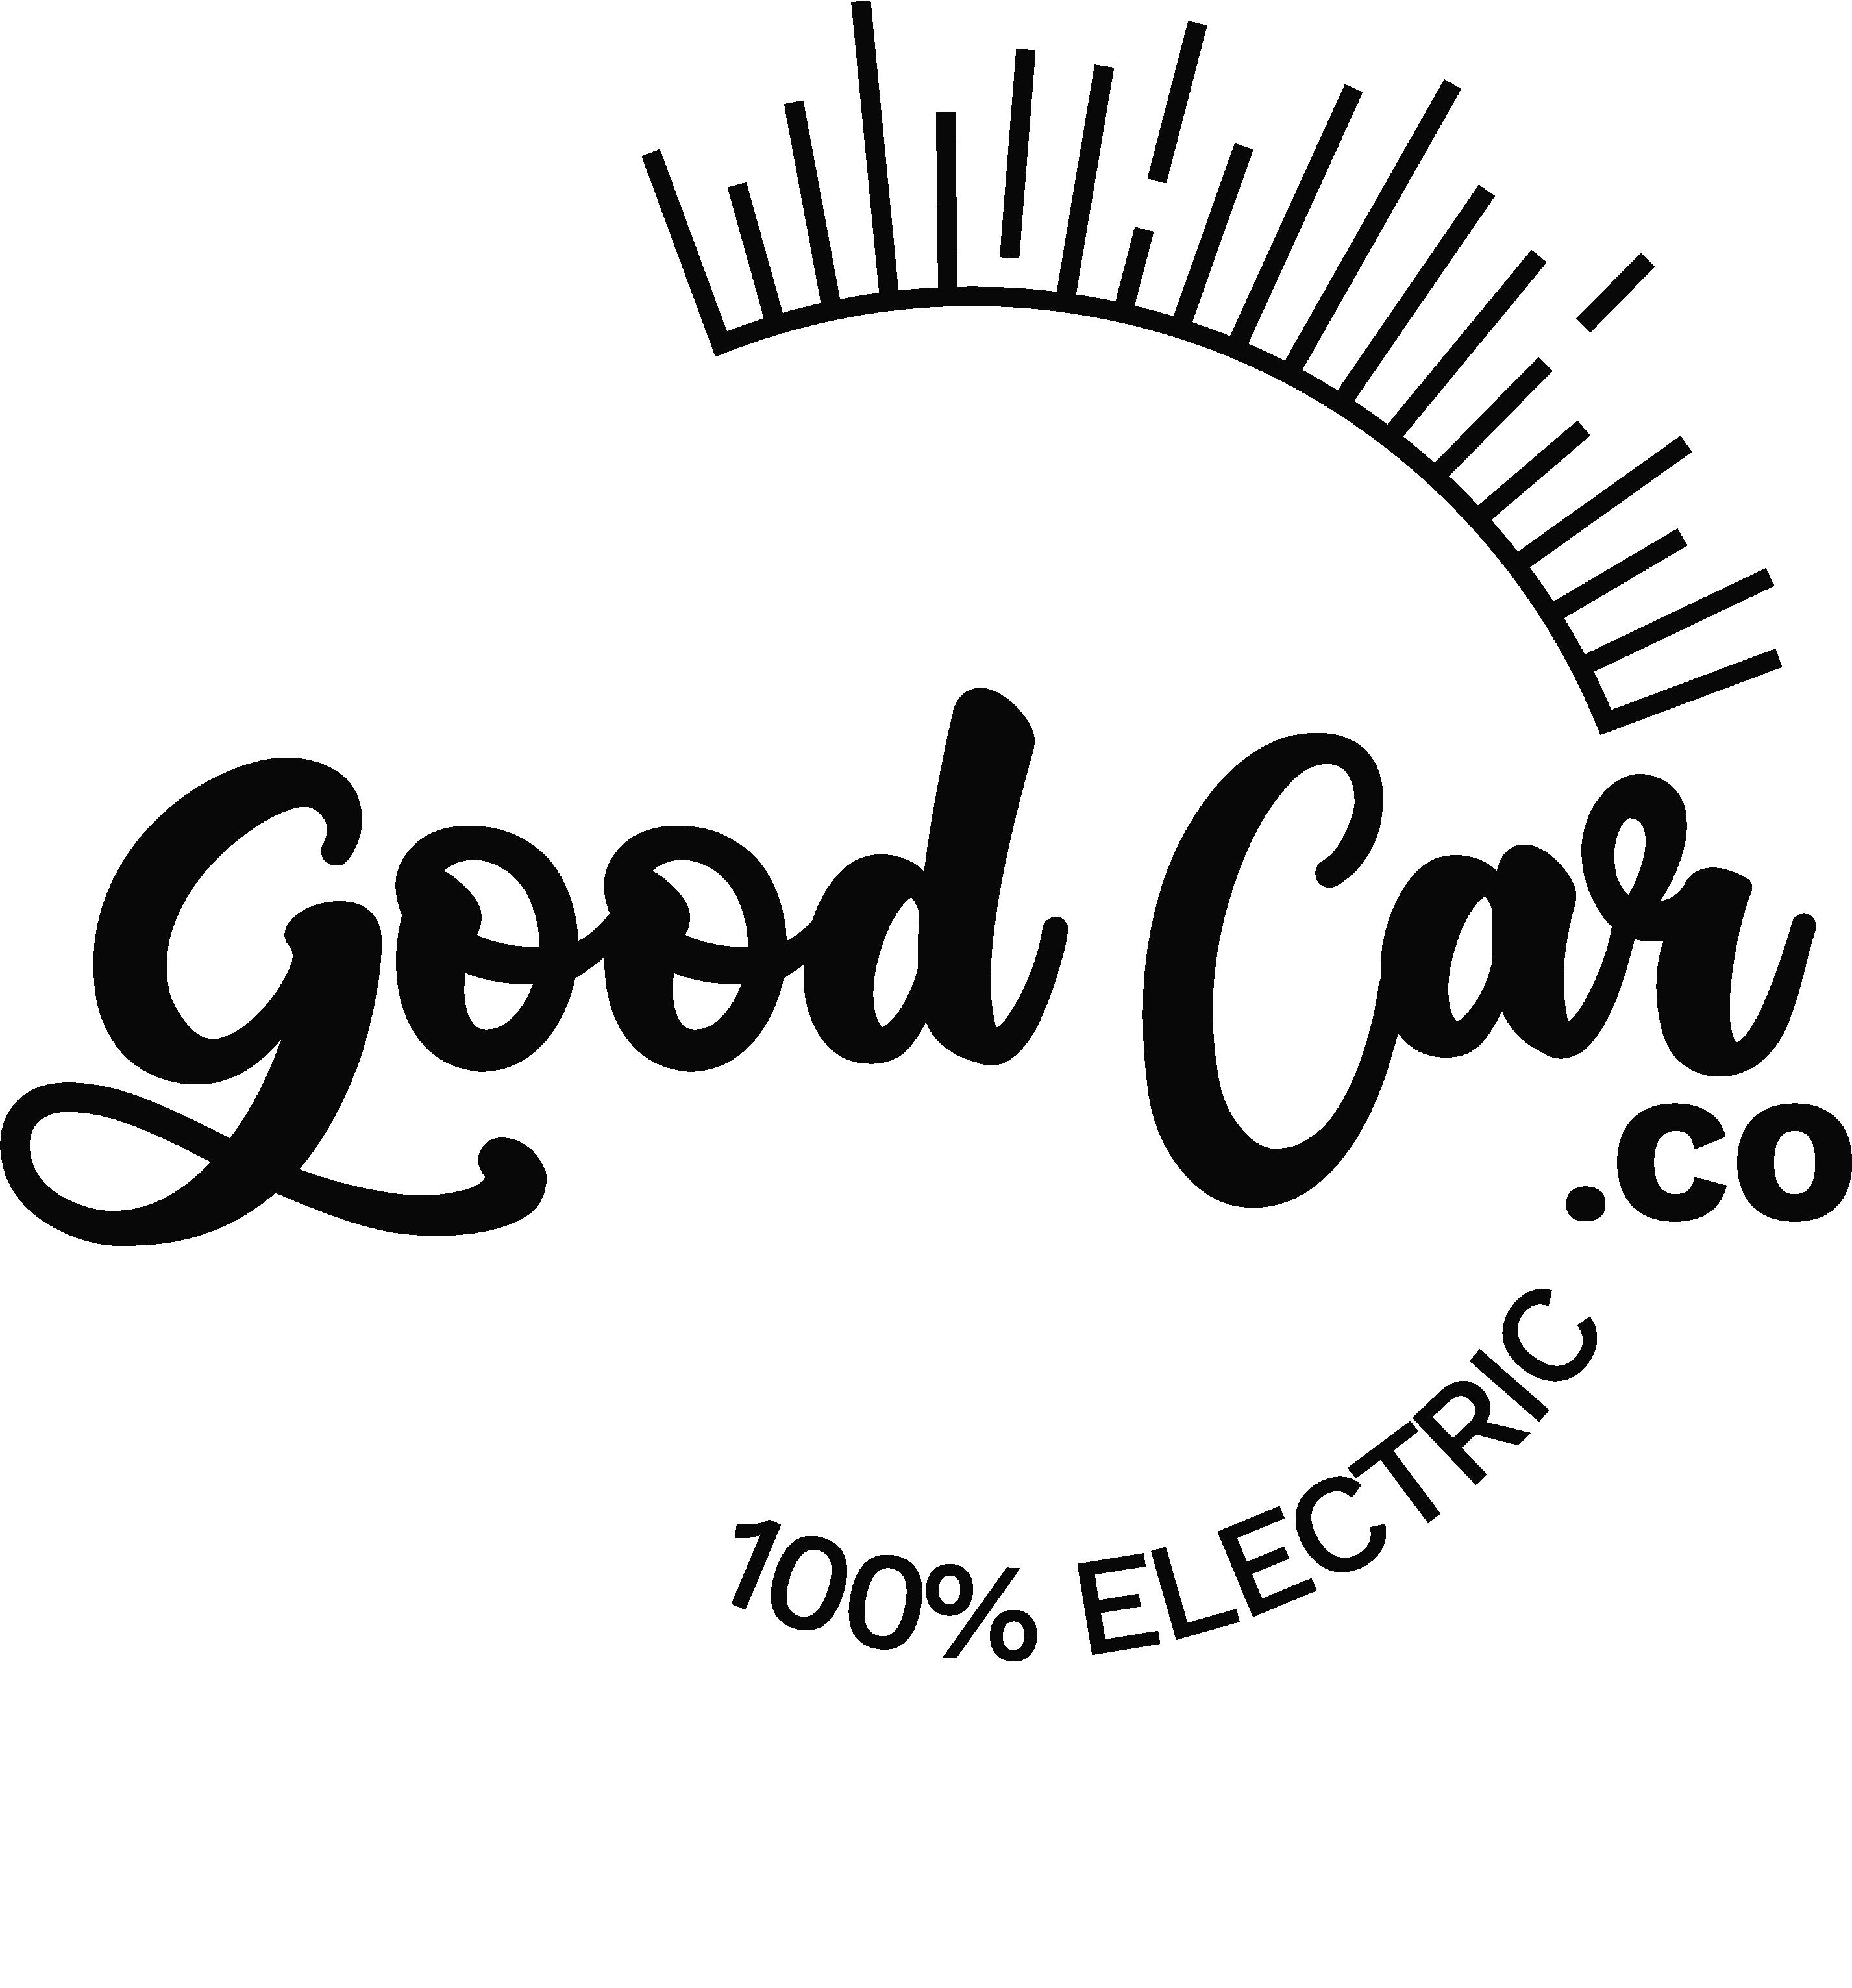 GoodCar_logo